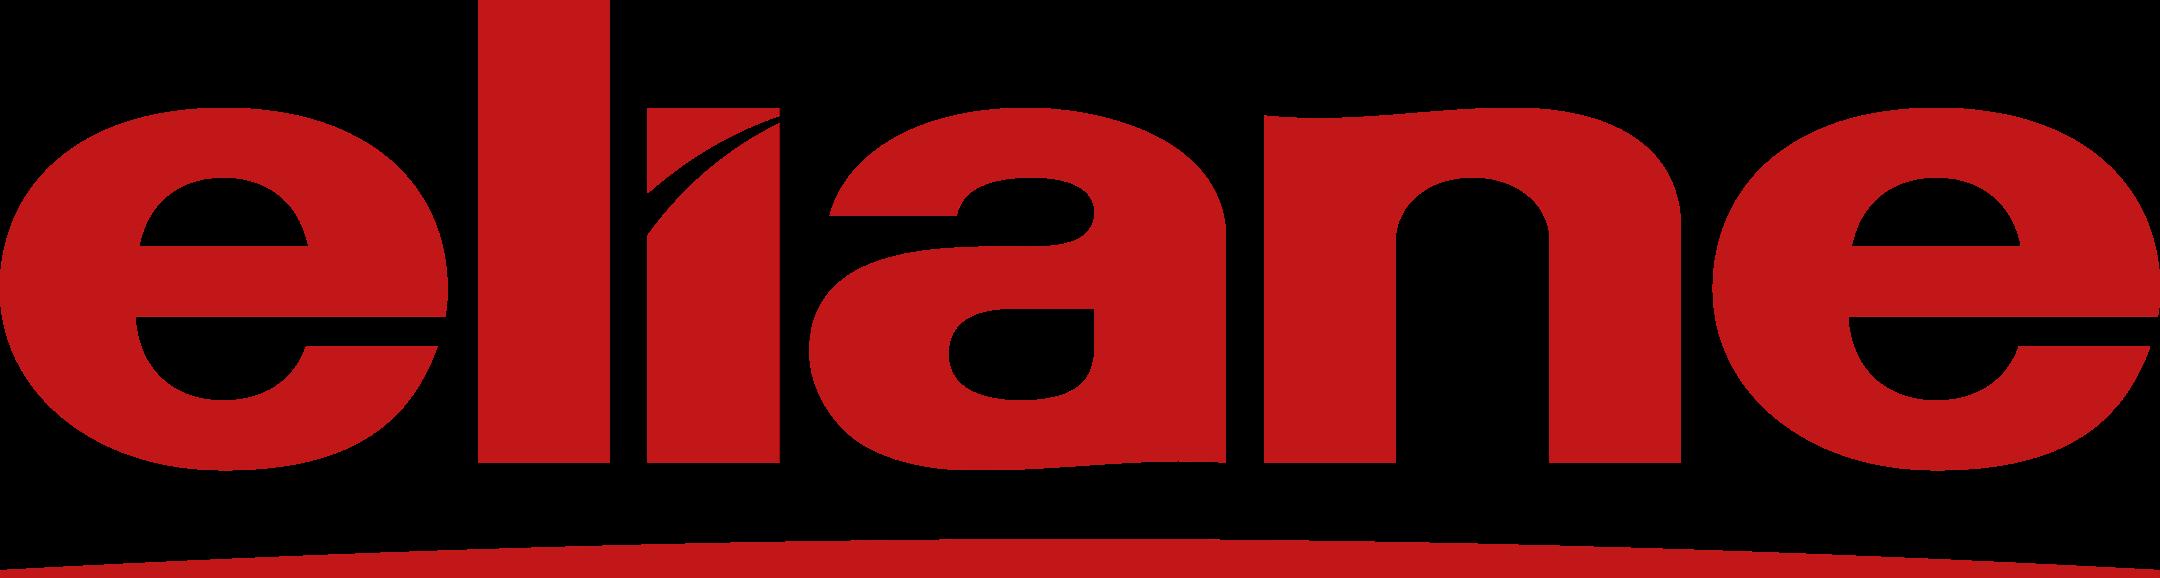 eliane logo 1 - Eliane Logo